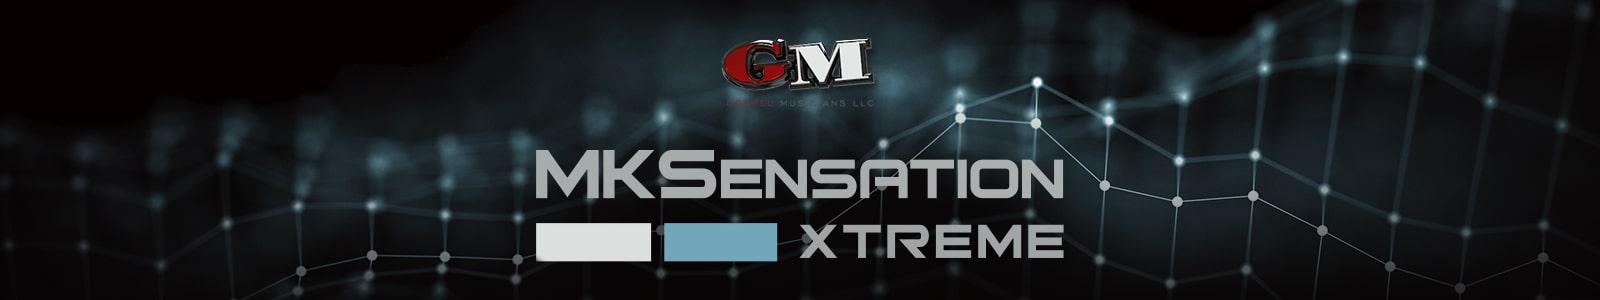 MKSensation Xtreme by Gospel Musicians